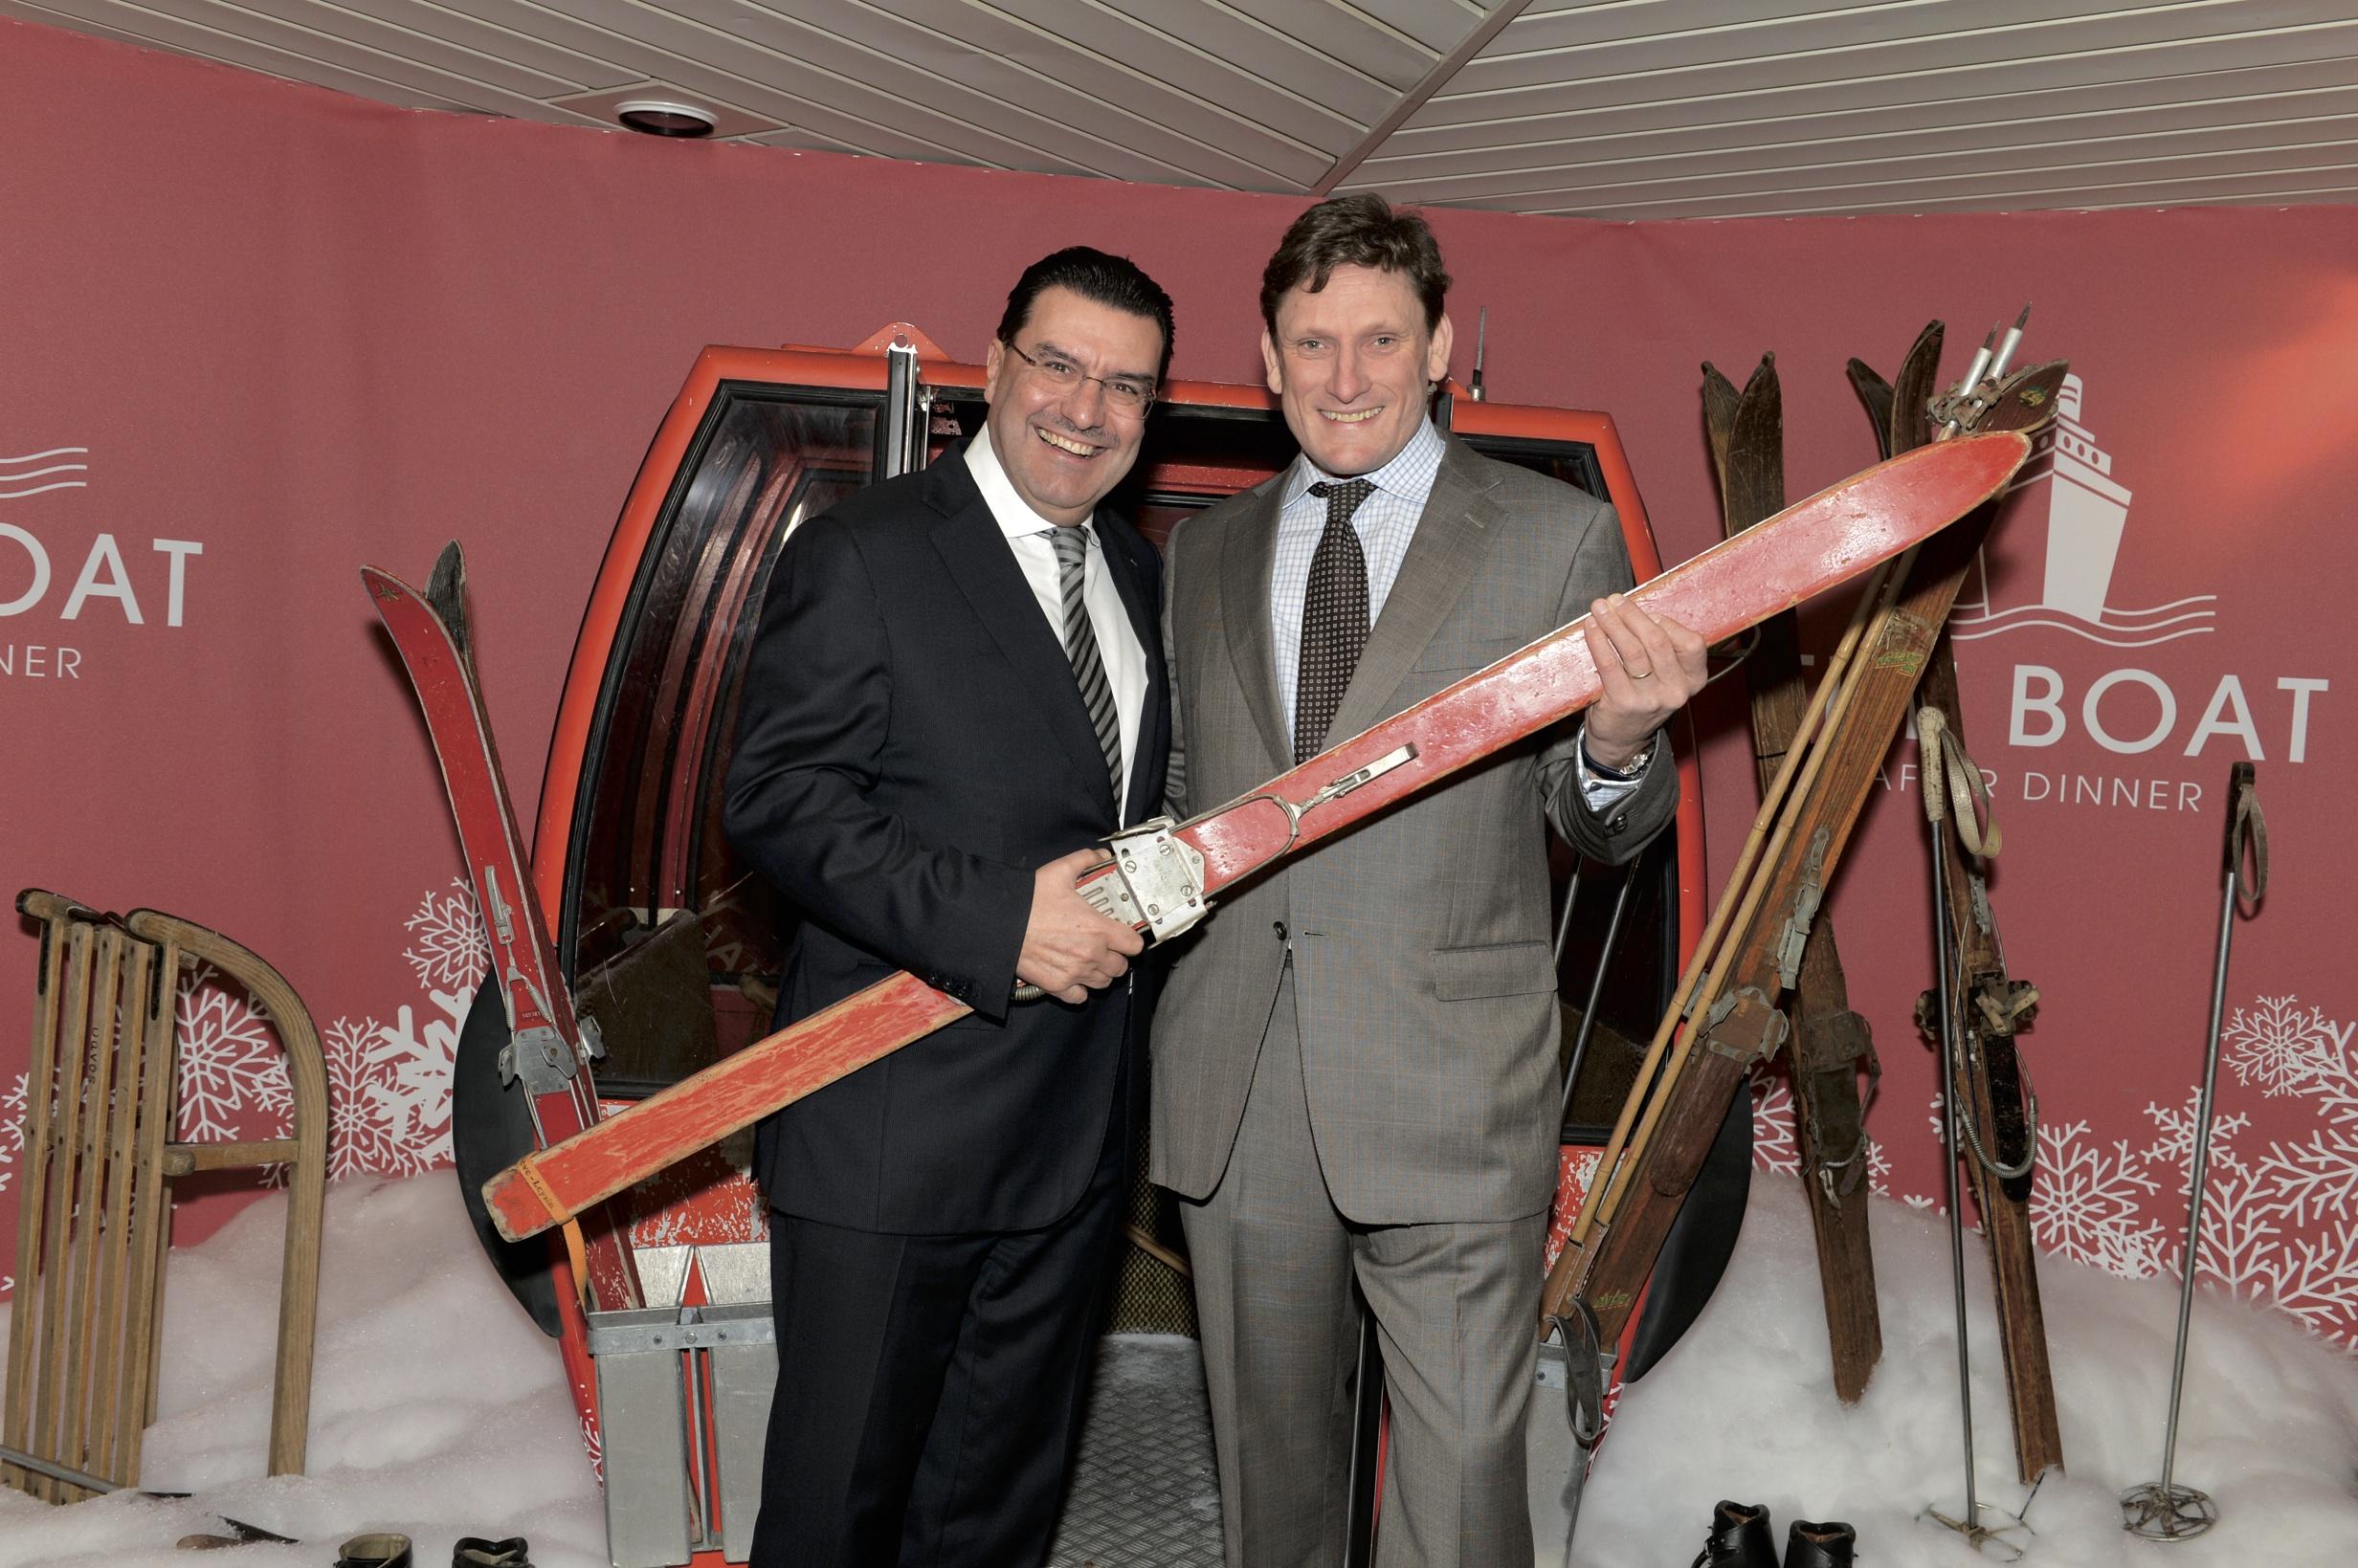 Juan-Carlos Torres, CEO, Vacheron Constantin. Stephen Forsey, Greubel and forsey.